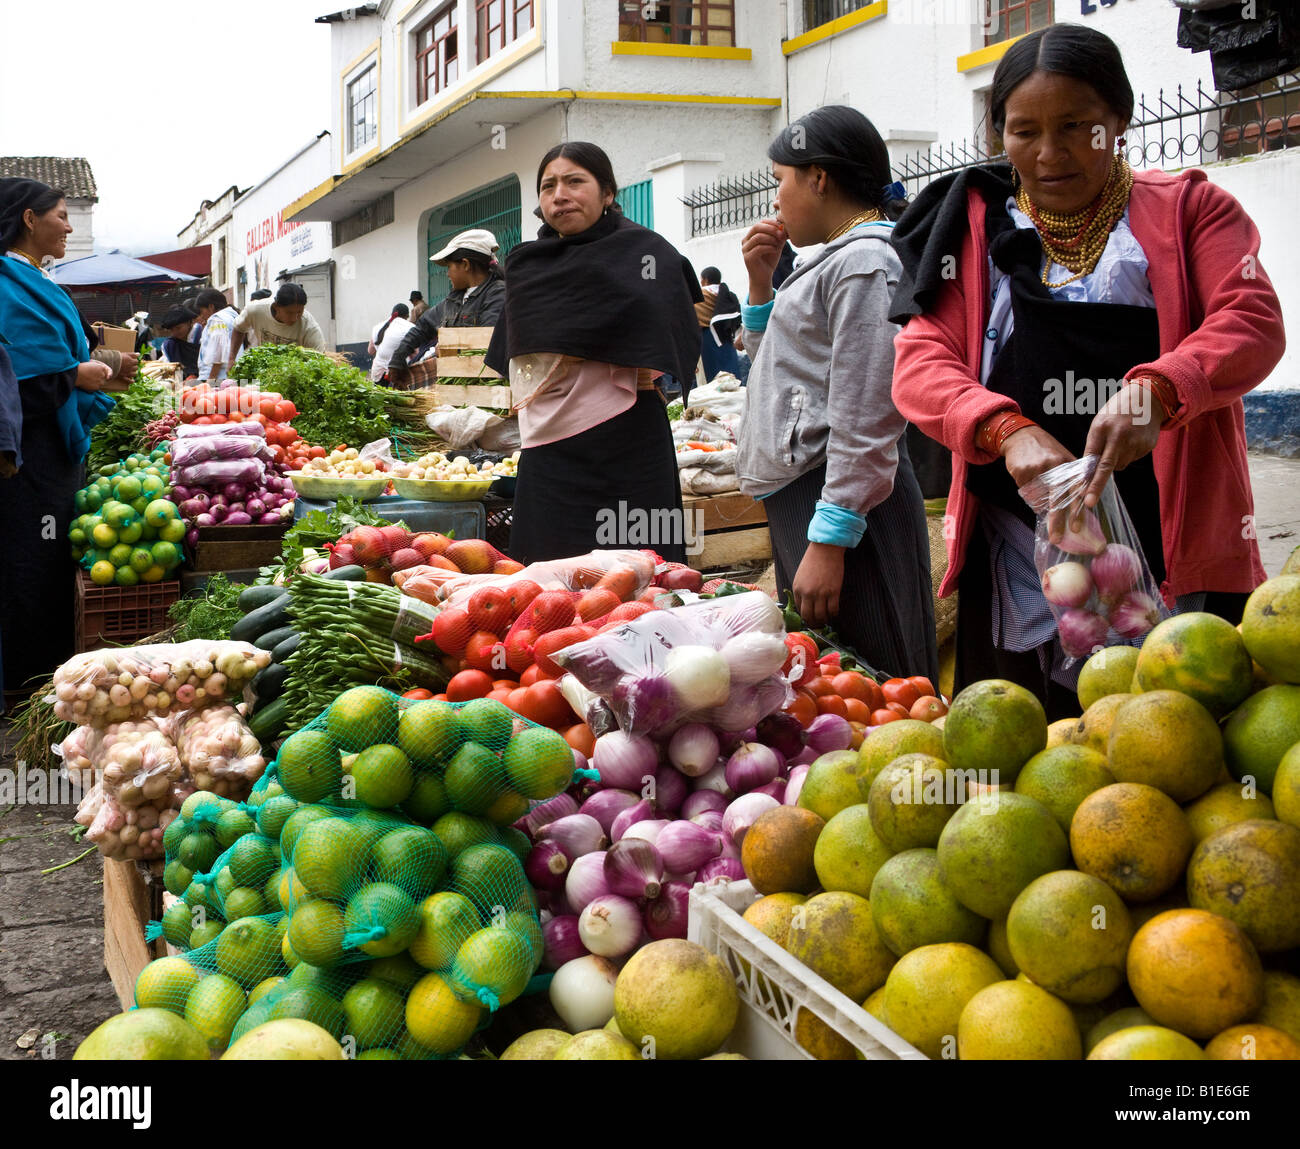 Lebensmittel-Markt in Otavalo im Norden Ecuadors in Südamerika Stockbild